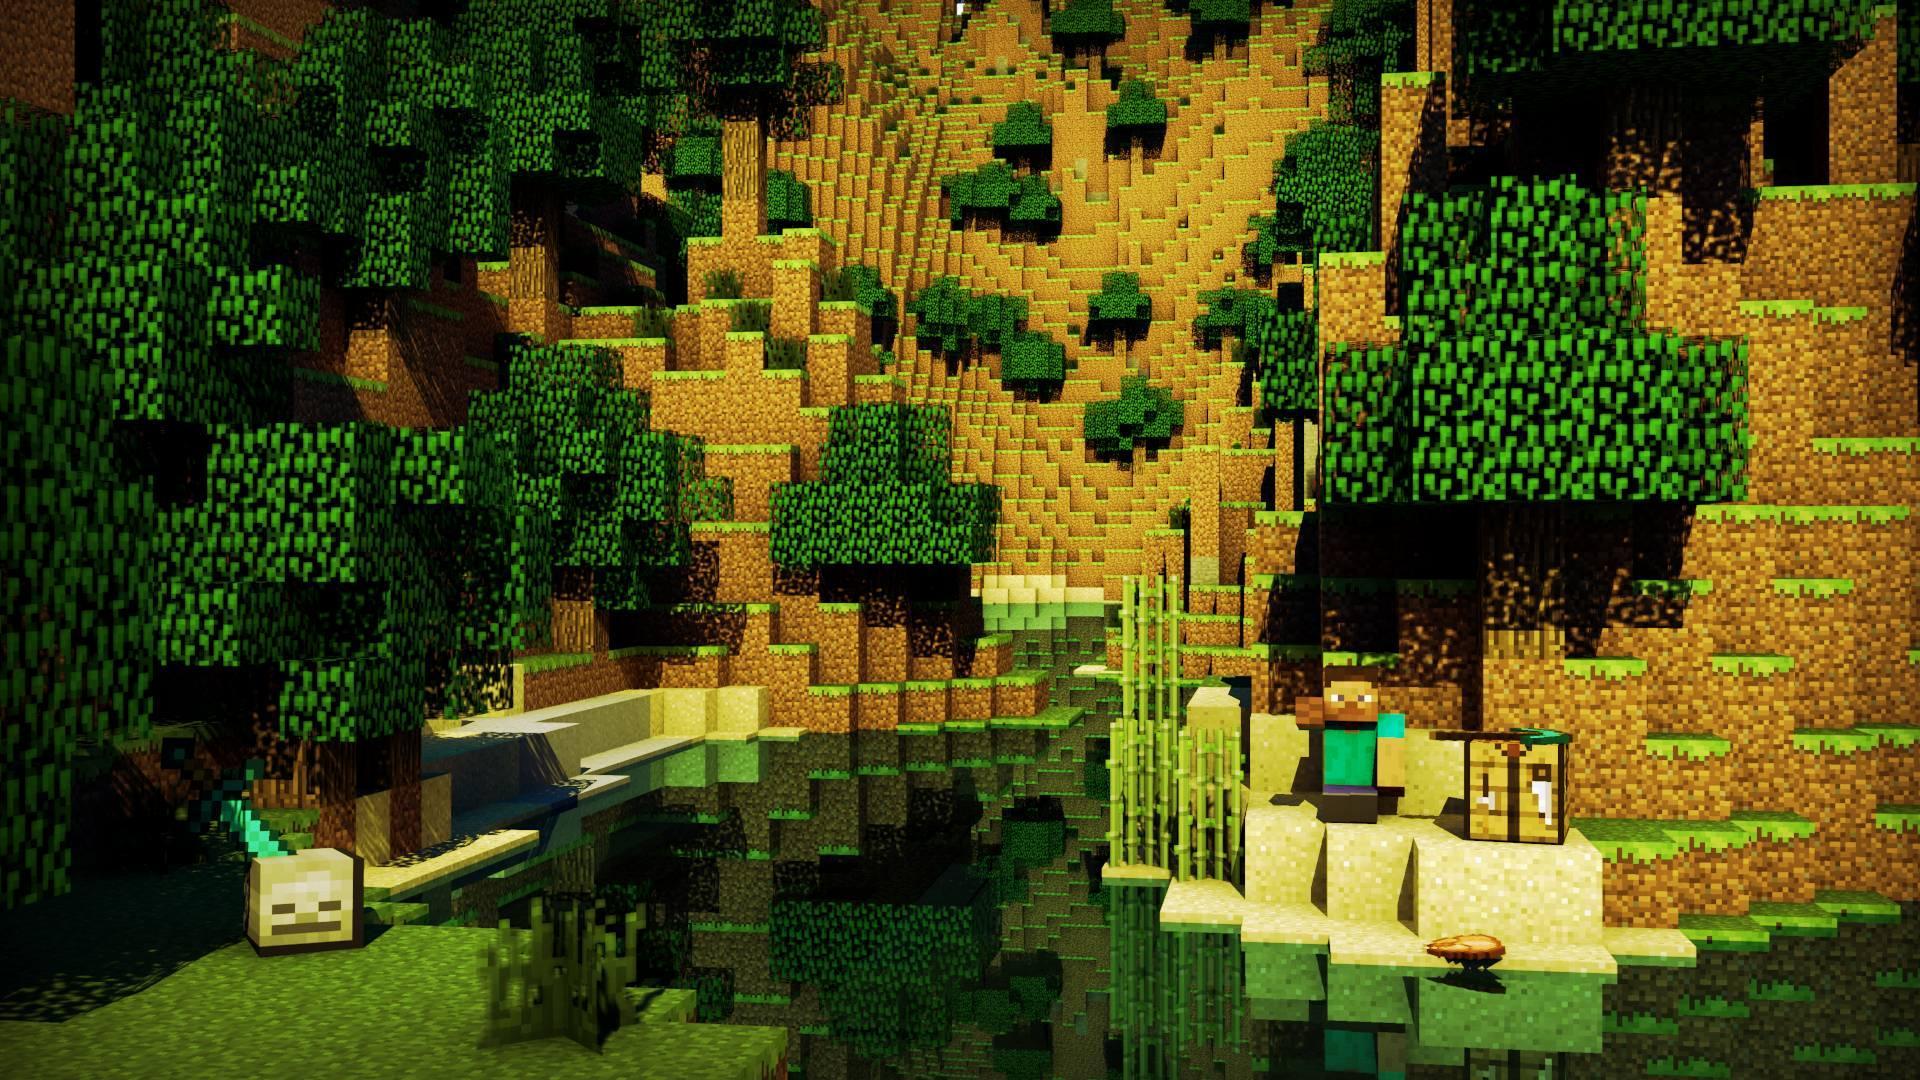 Minecraft Iphone Wallpaper Hd 1920x1080